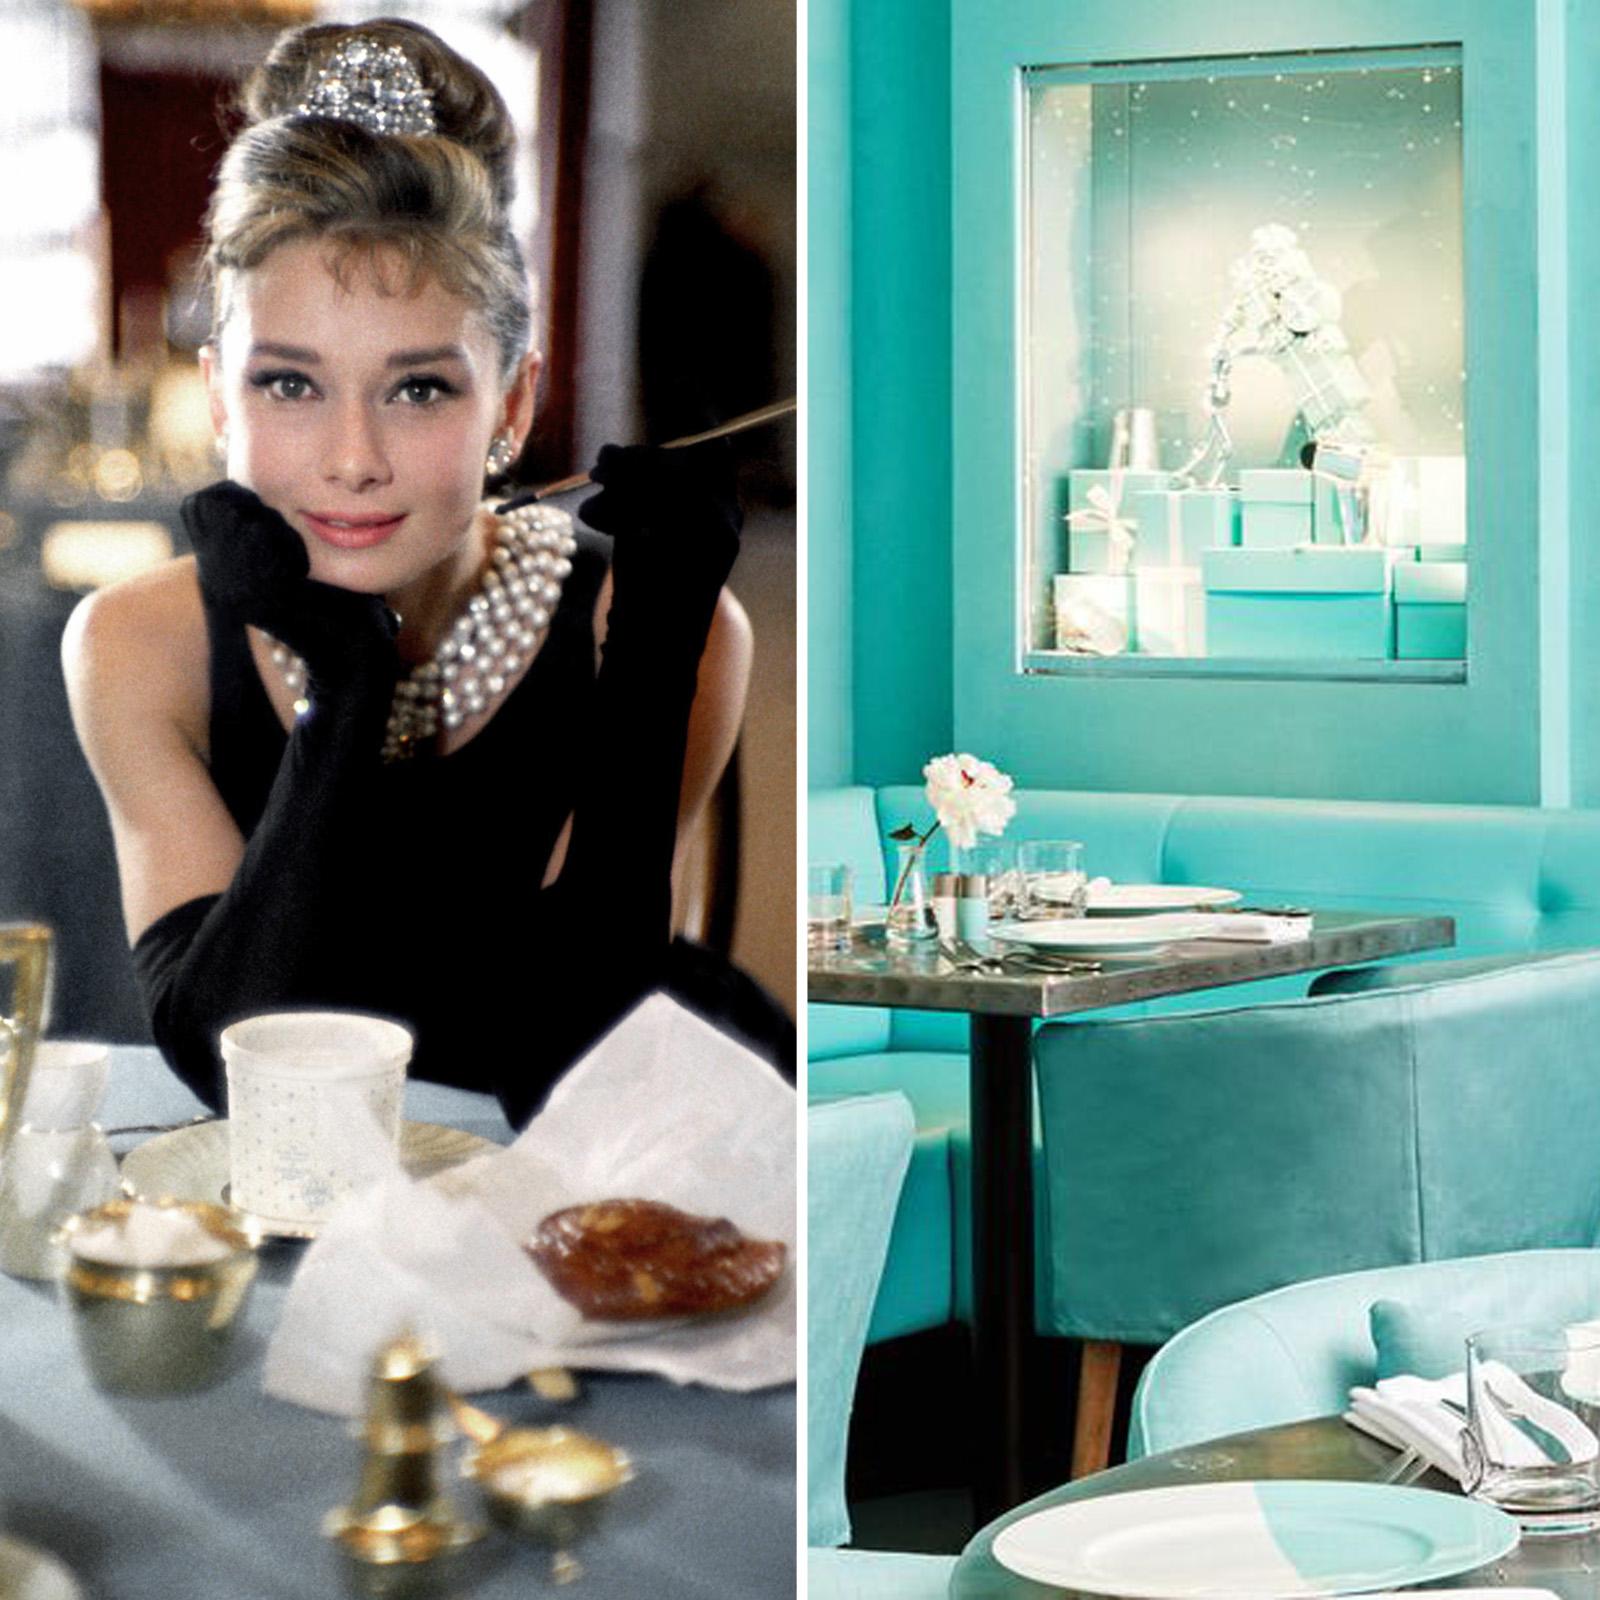 Tiffany & Co, Tiffany, breakfast at Tiffany, desayuno, tienda